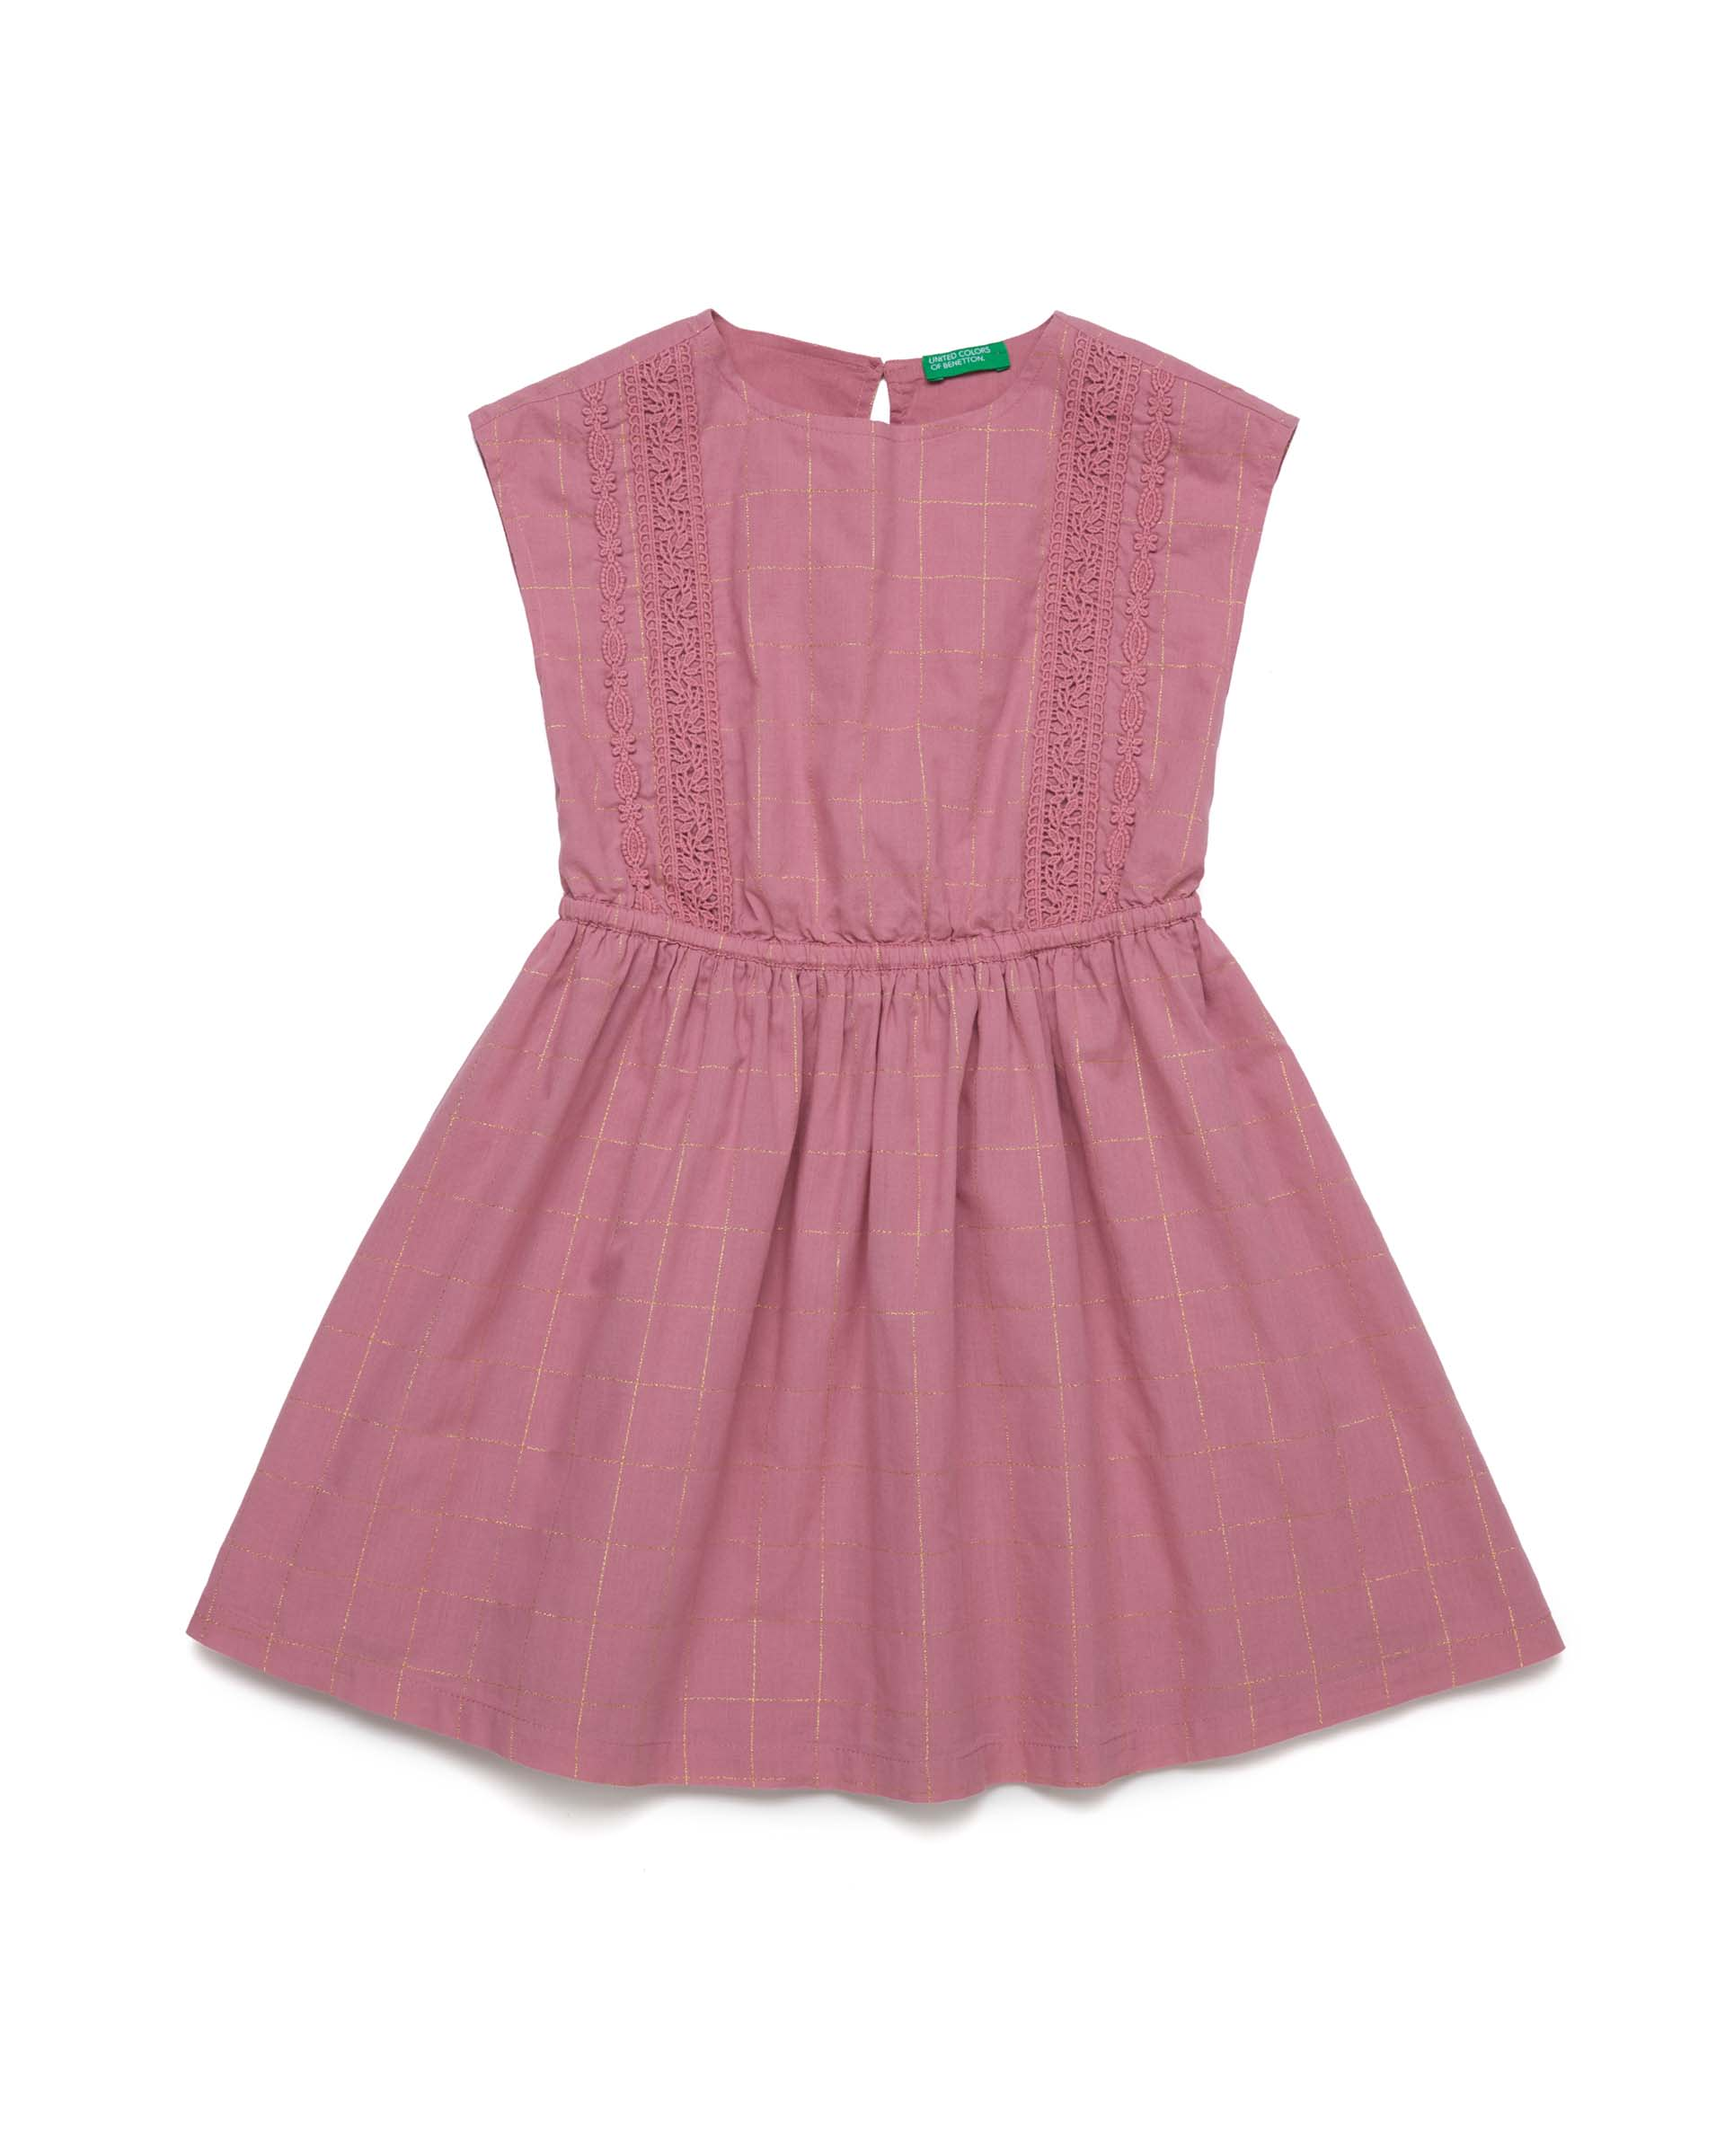 20P_4OV55VDH0_910, Платье для девочек Benetton 4OV55VDH0_910 р-р 140, United Colors of Benetton, Платья для девочек  - купить со скидкой